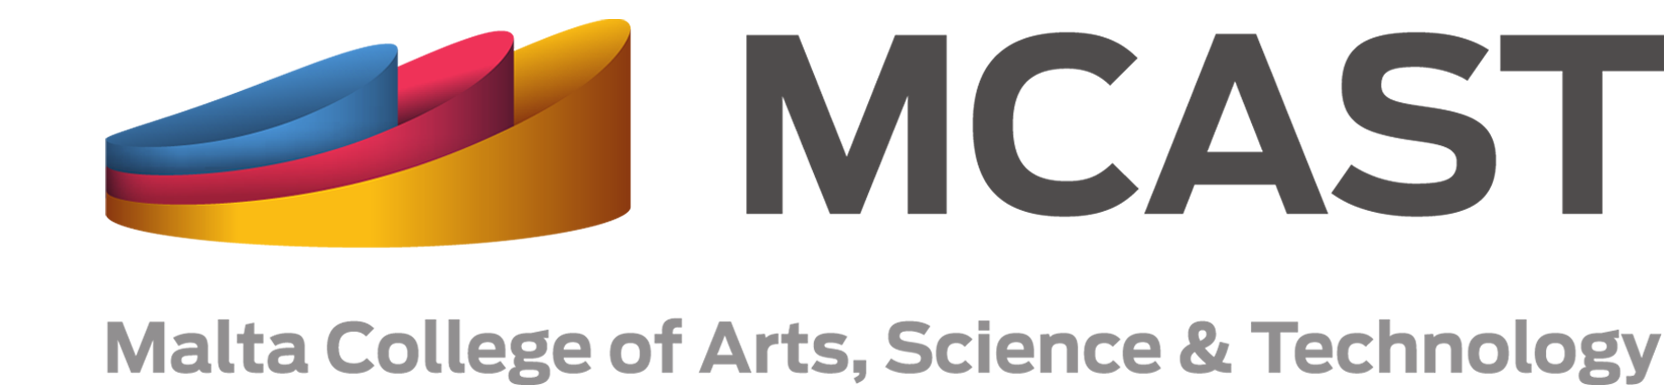 mcast dissertation guidelines